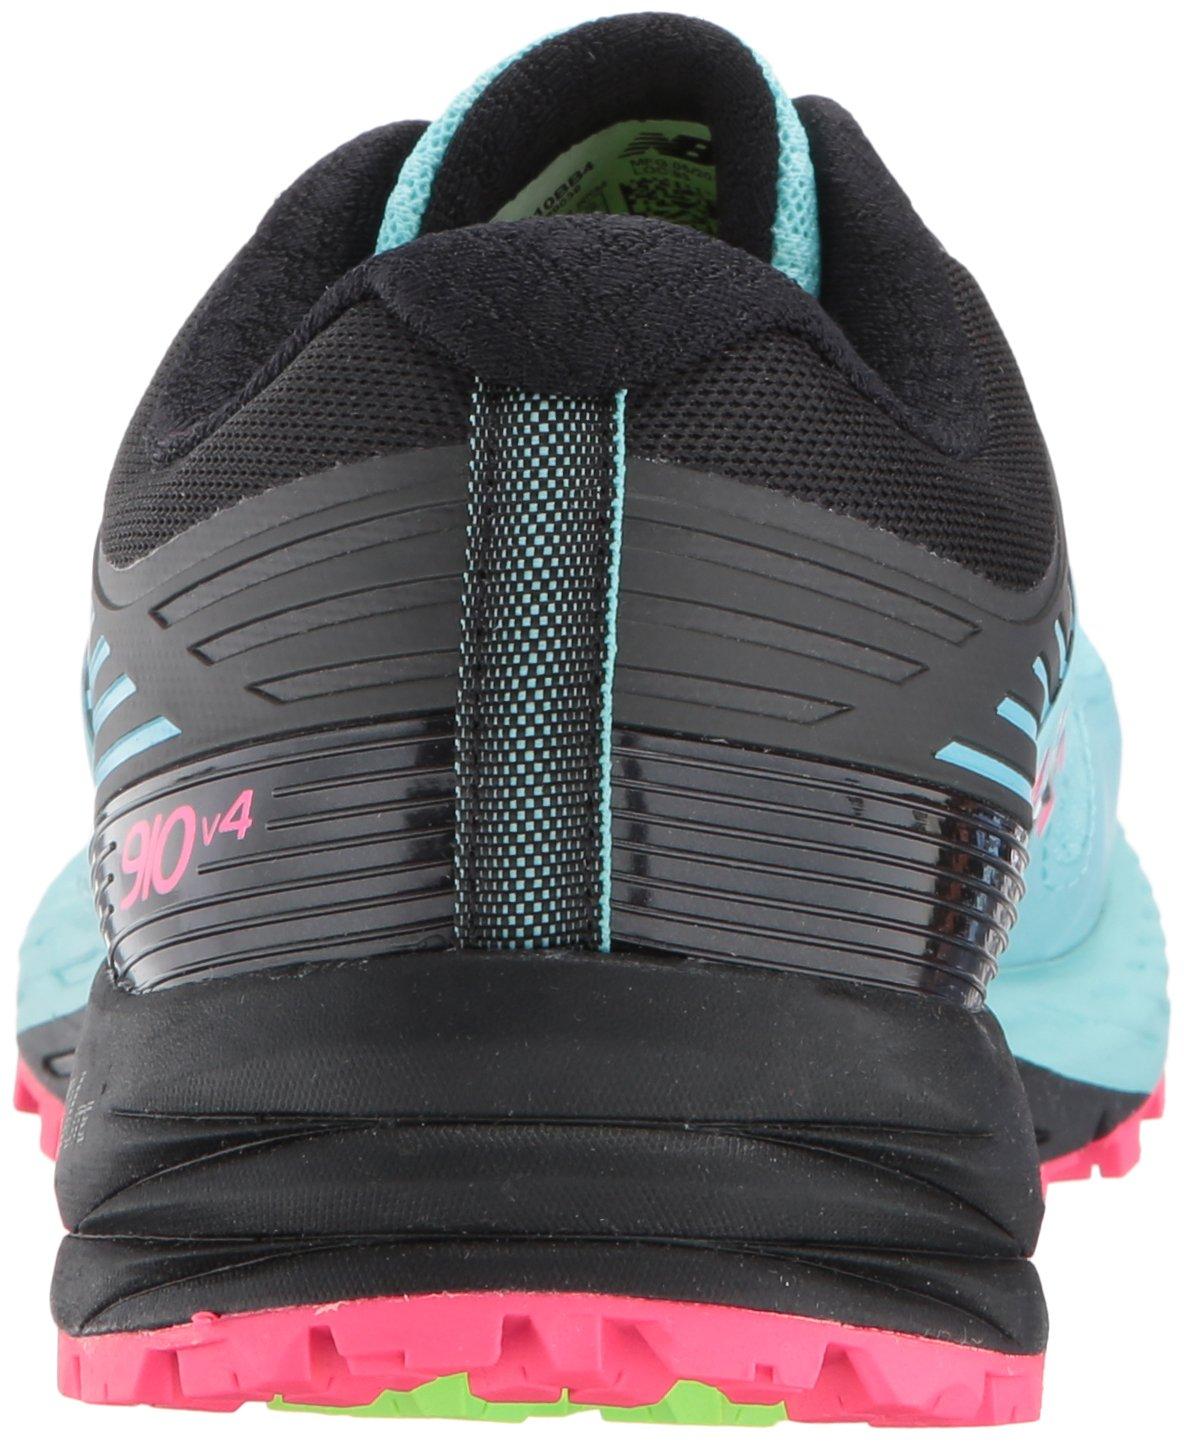 New Balance Women's 910v4 Running Shoe B01MXNY6WP 6.5 D US|Sea Spray/Alpha Pink